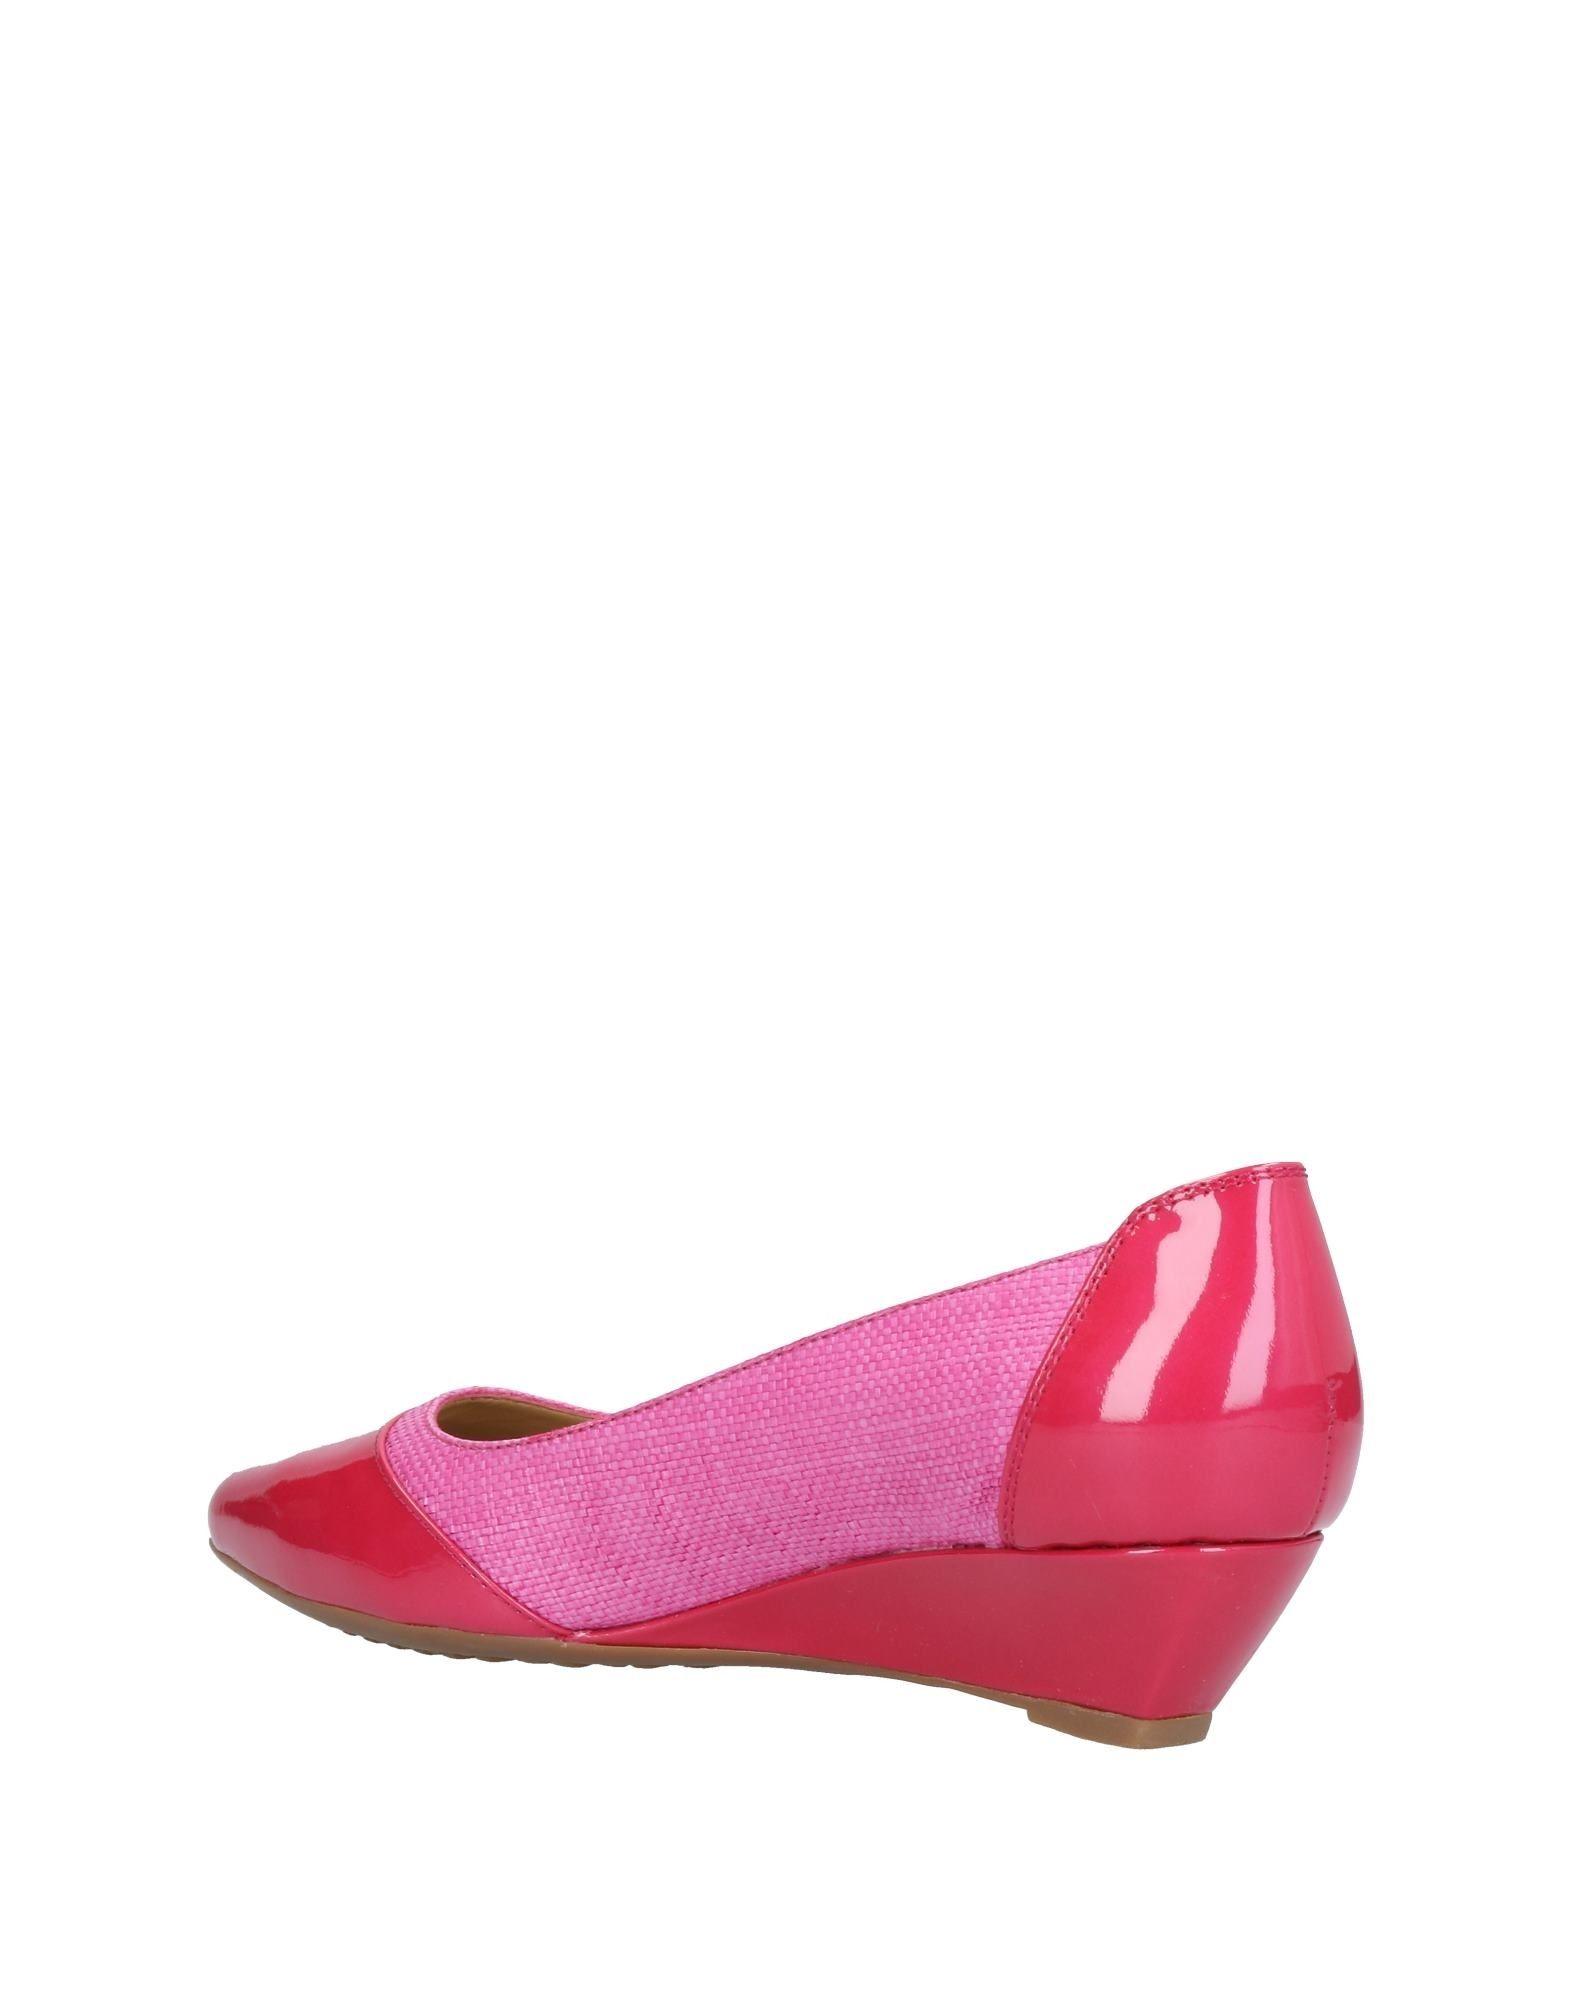 Damen Hogan Pumps Damen   11459890IV Heiße Schuhe c6b45e